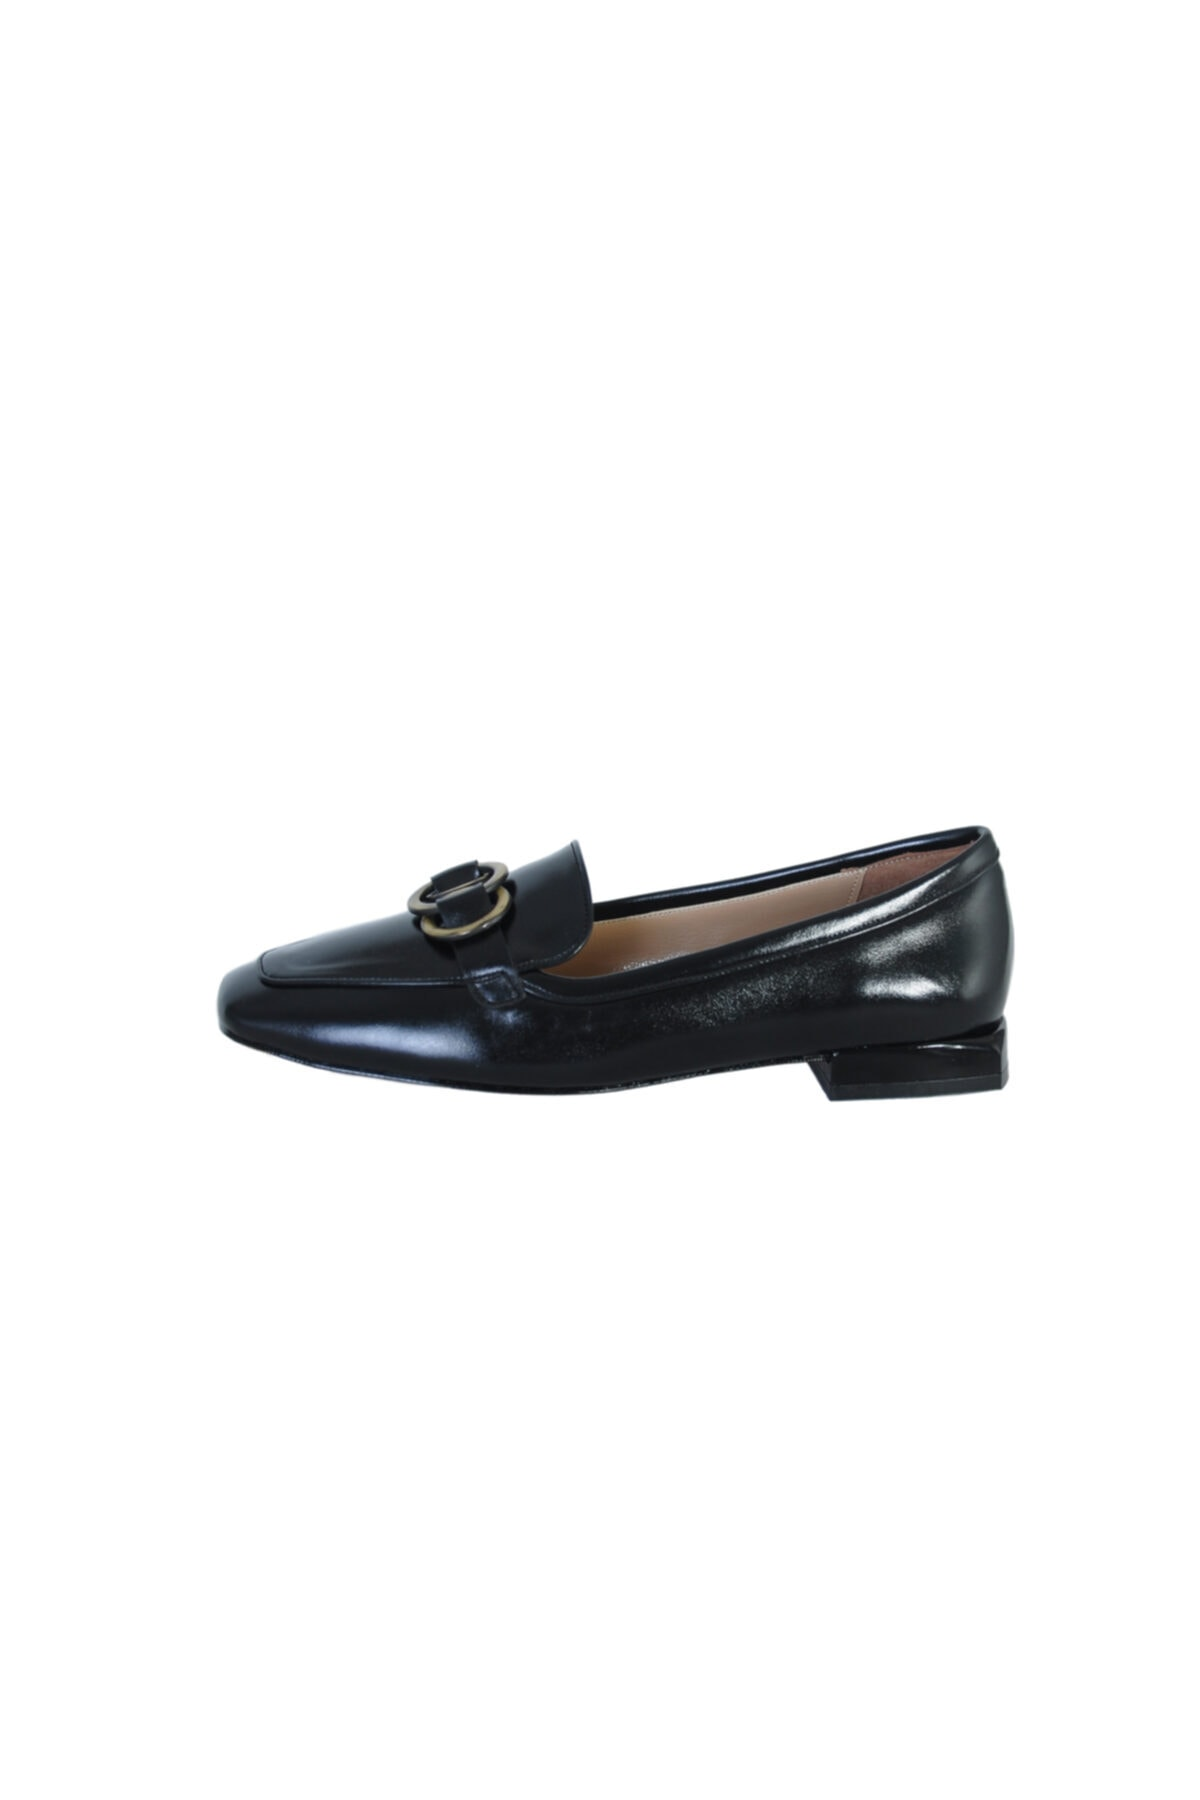 KEMAL TANCA Kadın Siyah  Ayakkabı 2